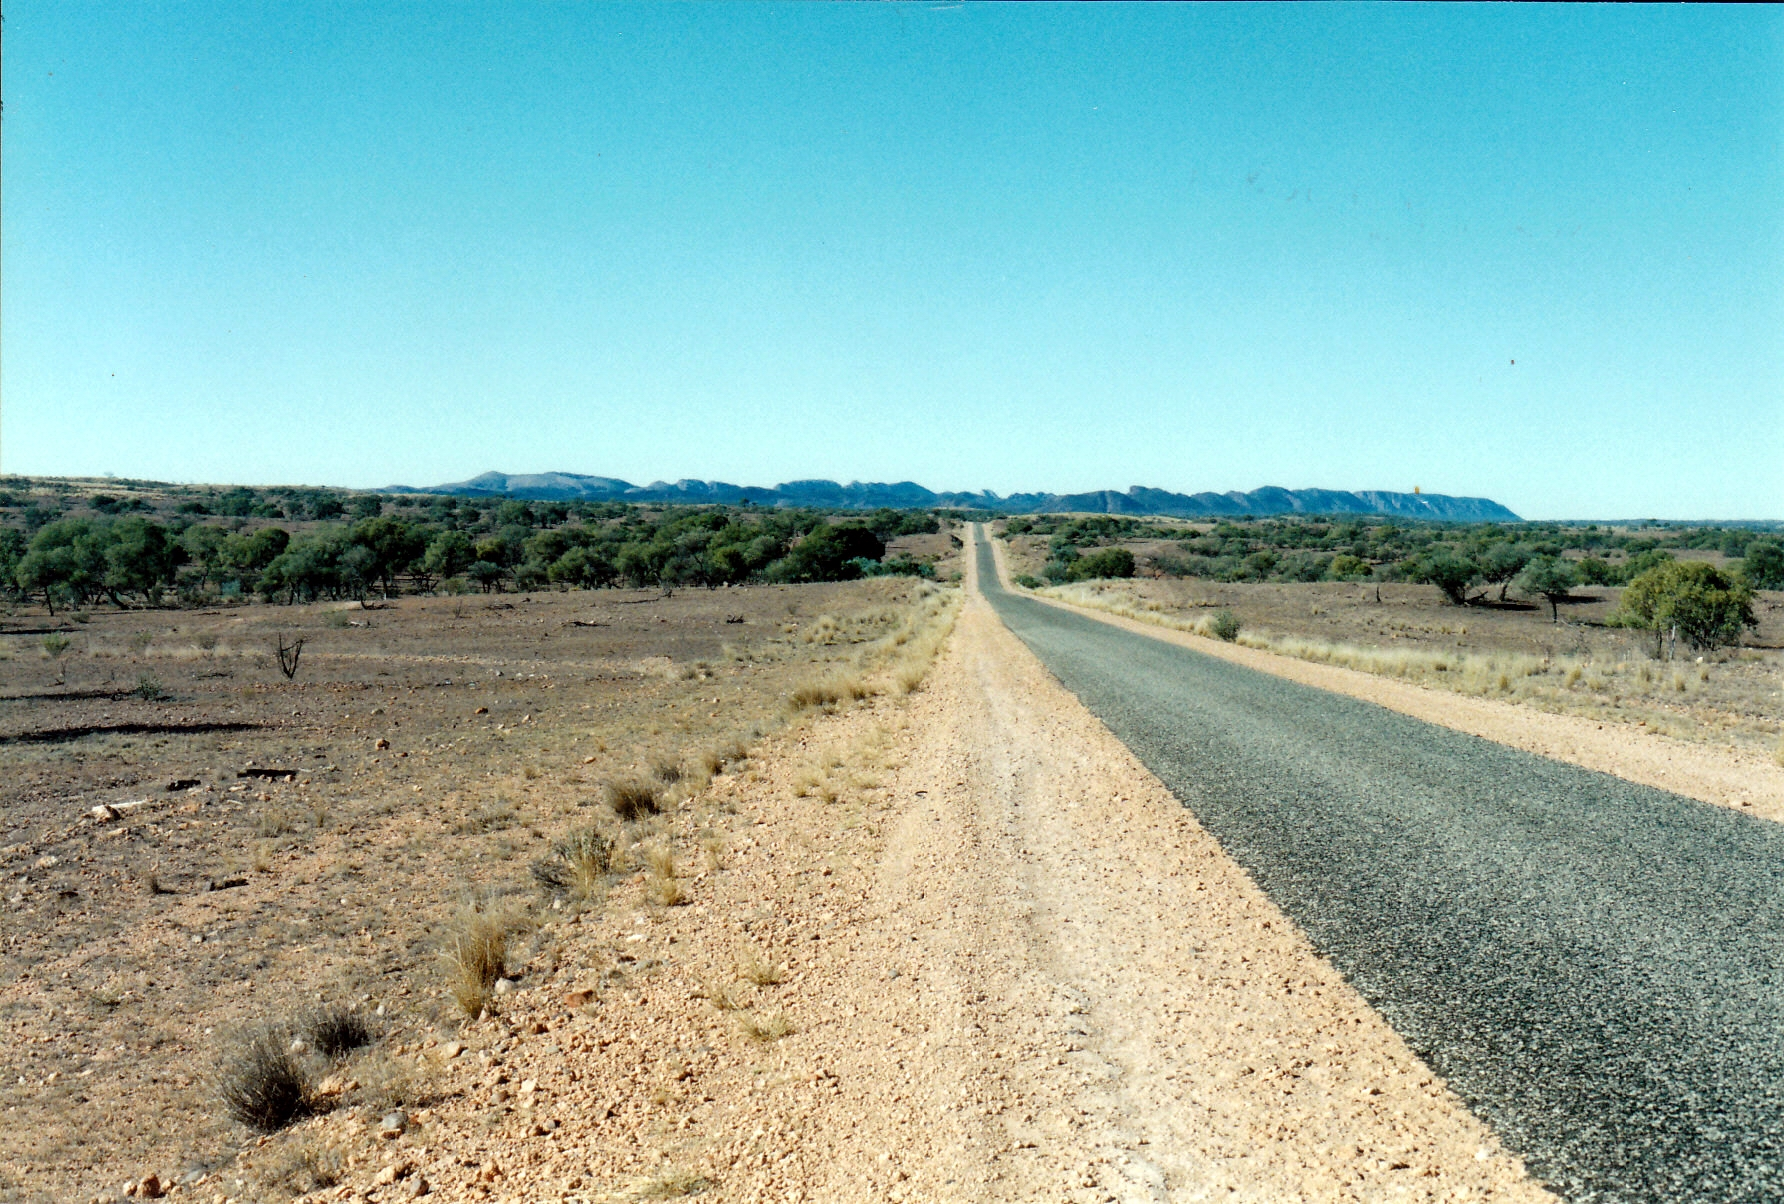 06-16-1999 larapinta rd.jpg